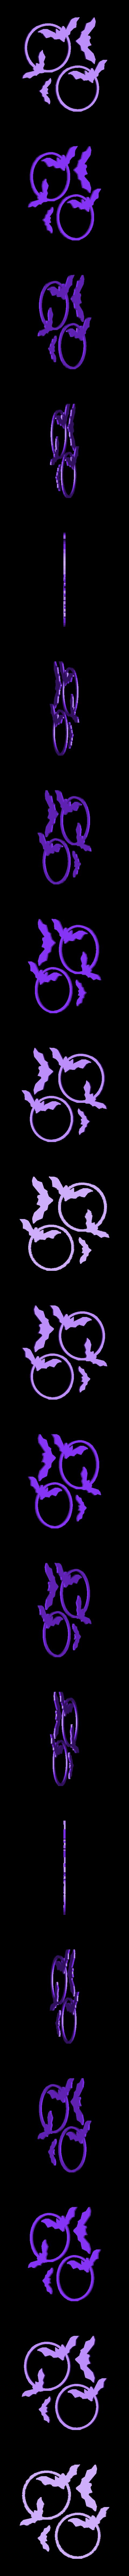 chauve souris.stl Download STL file Halloween (full of wall decoration) • 3D print model, catf3d